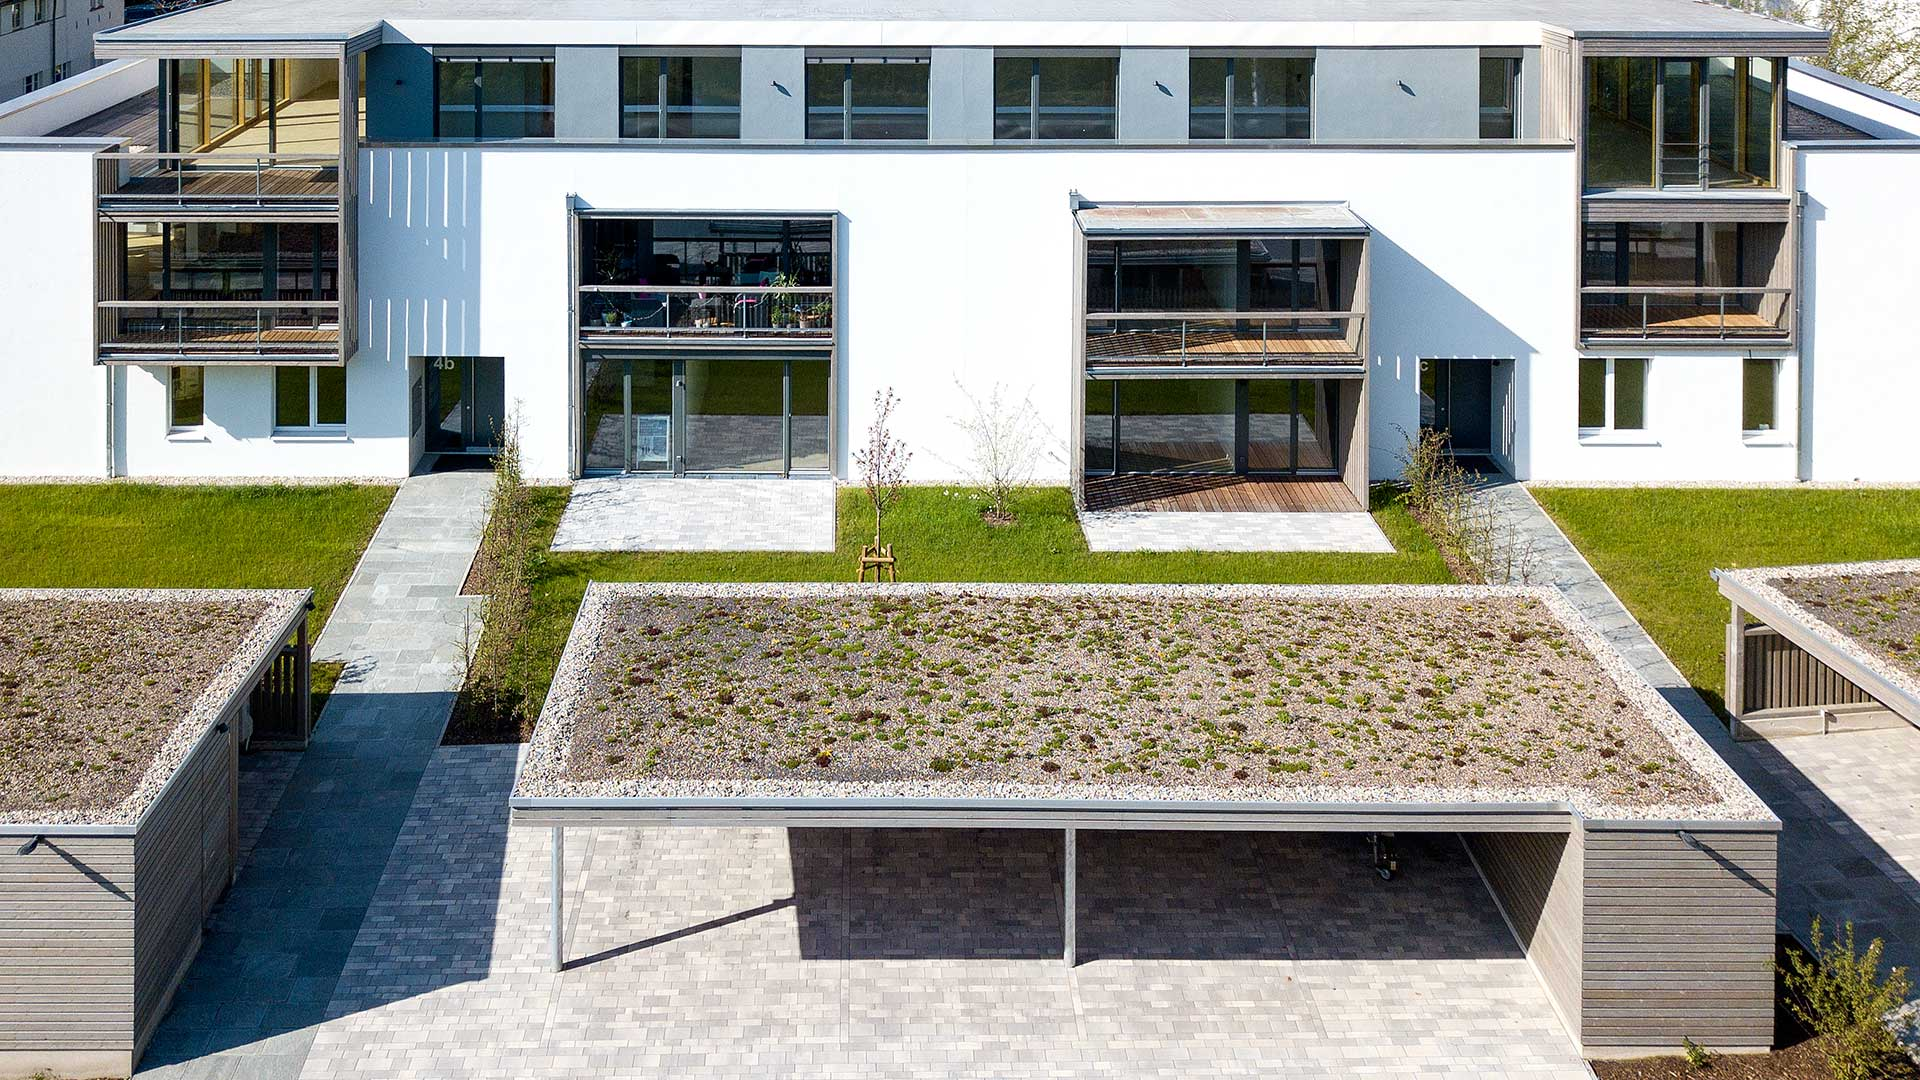 Architekturfotografie, Drohne: Luftaufnahme Neubau | Foto: Dieter Eikenberg, imprints